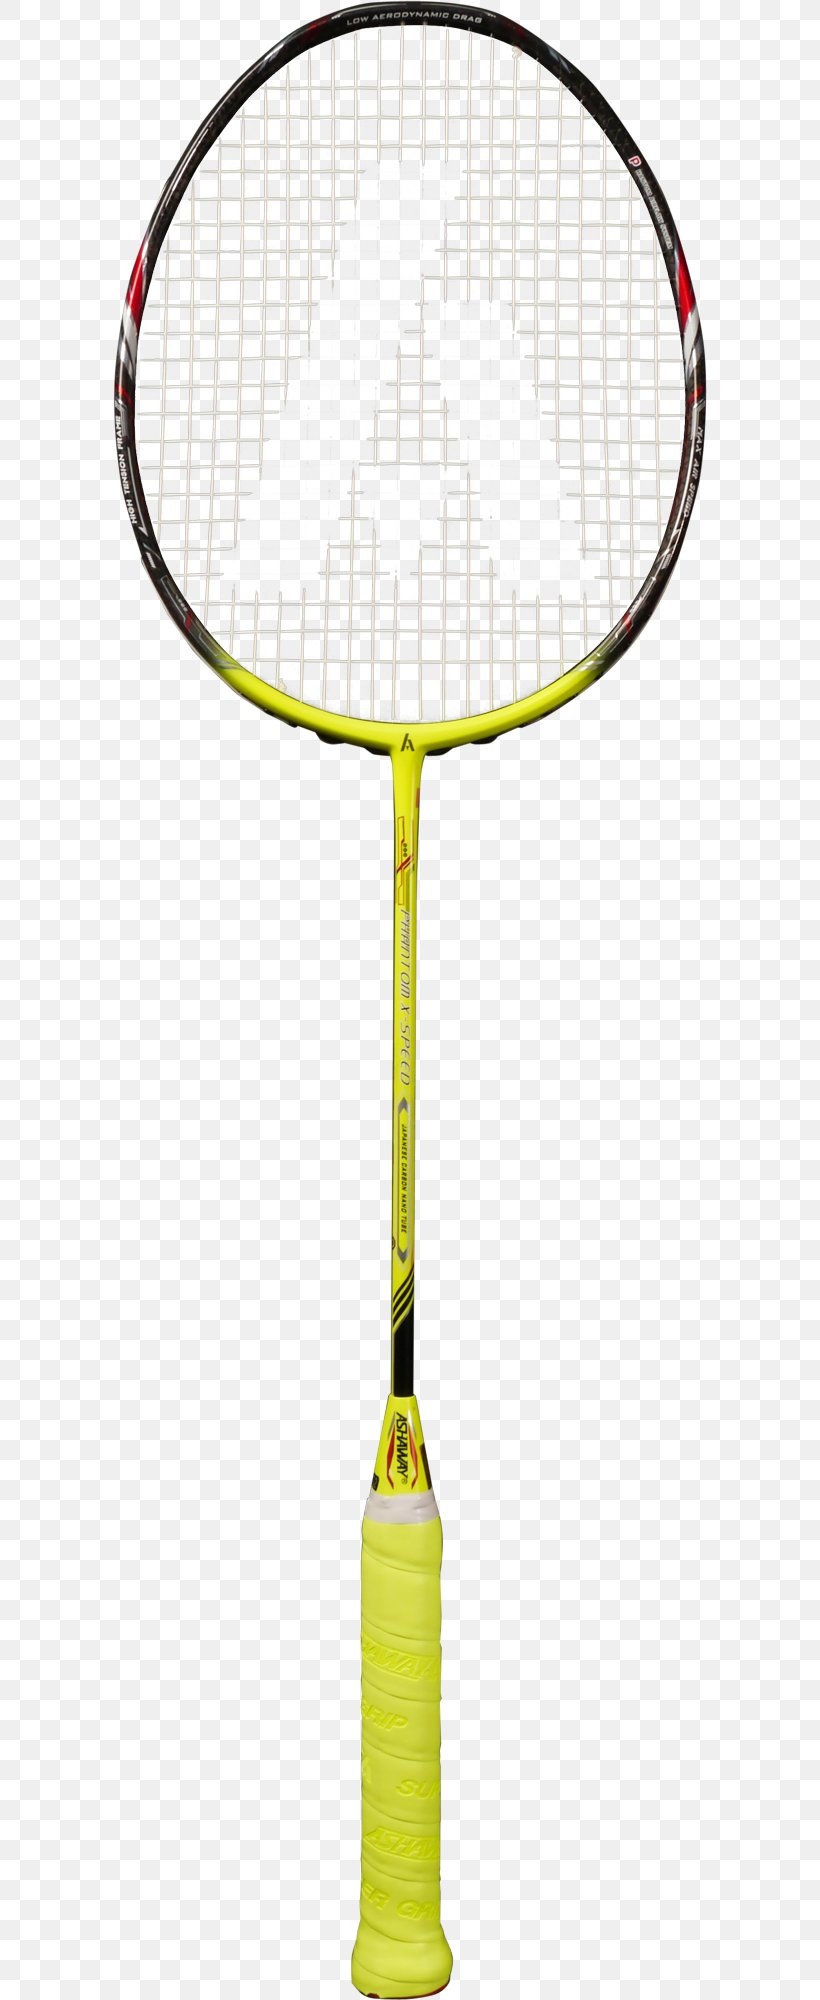 Badminton Racket Shuttlecock, PNG, 594x2000px, Racket, Area, Badminton, Badmintonracket, Baseball Bats Download Free